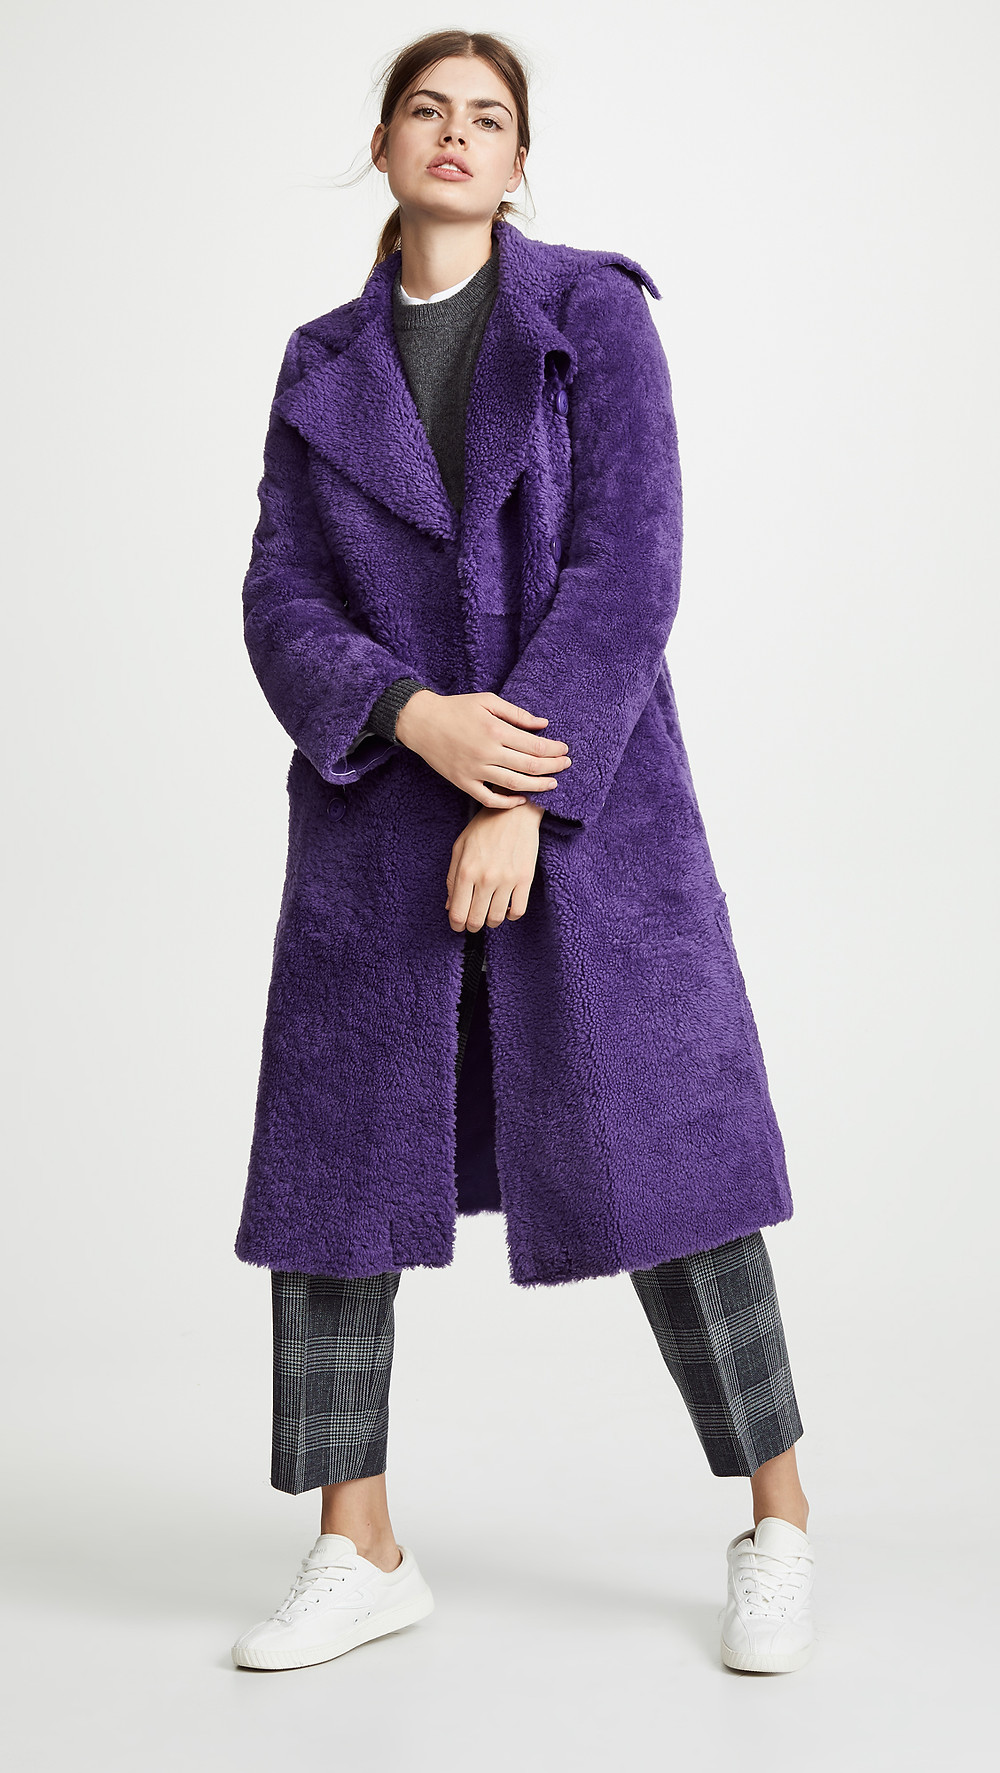 Anne Vest Edit Trench Shearling Coat $2,230